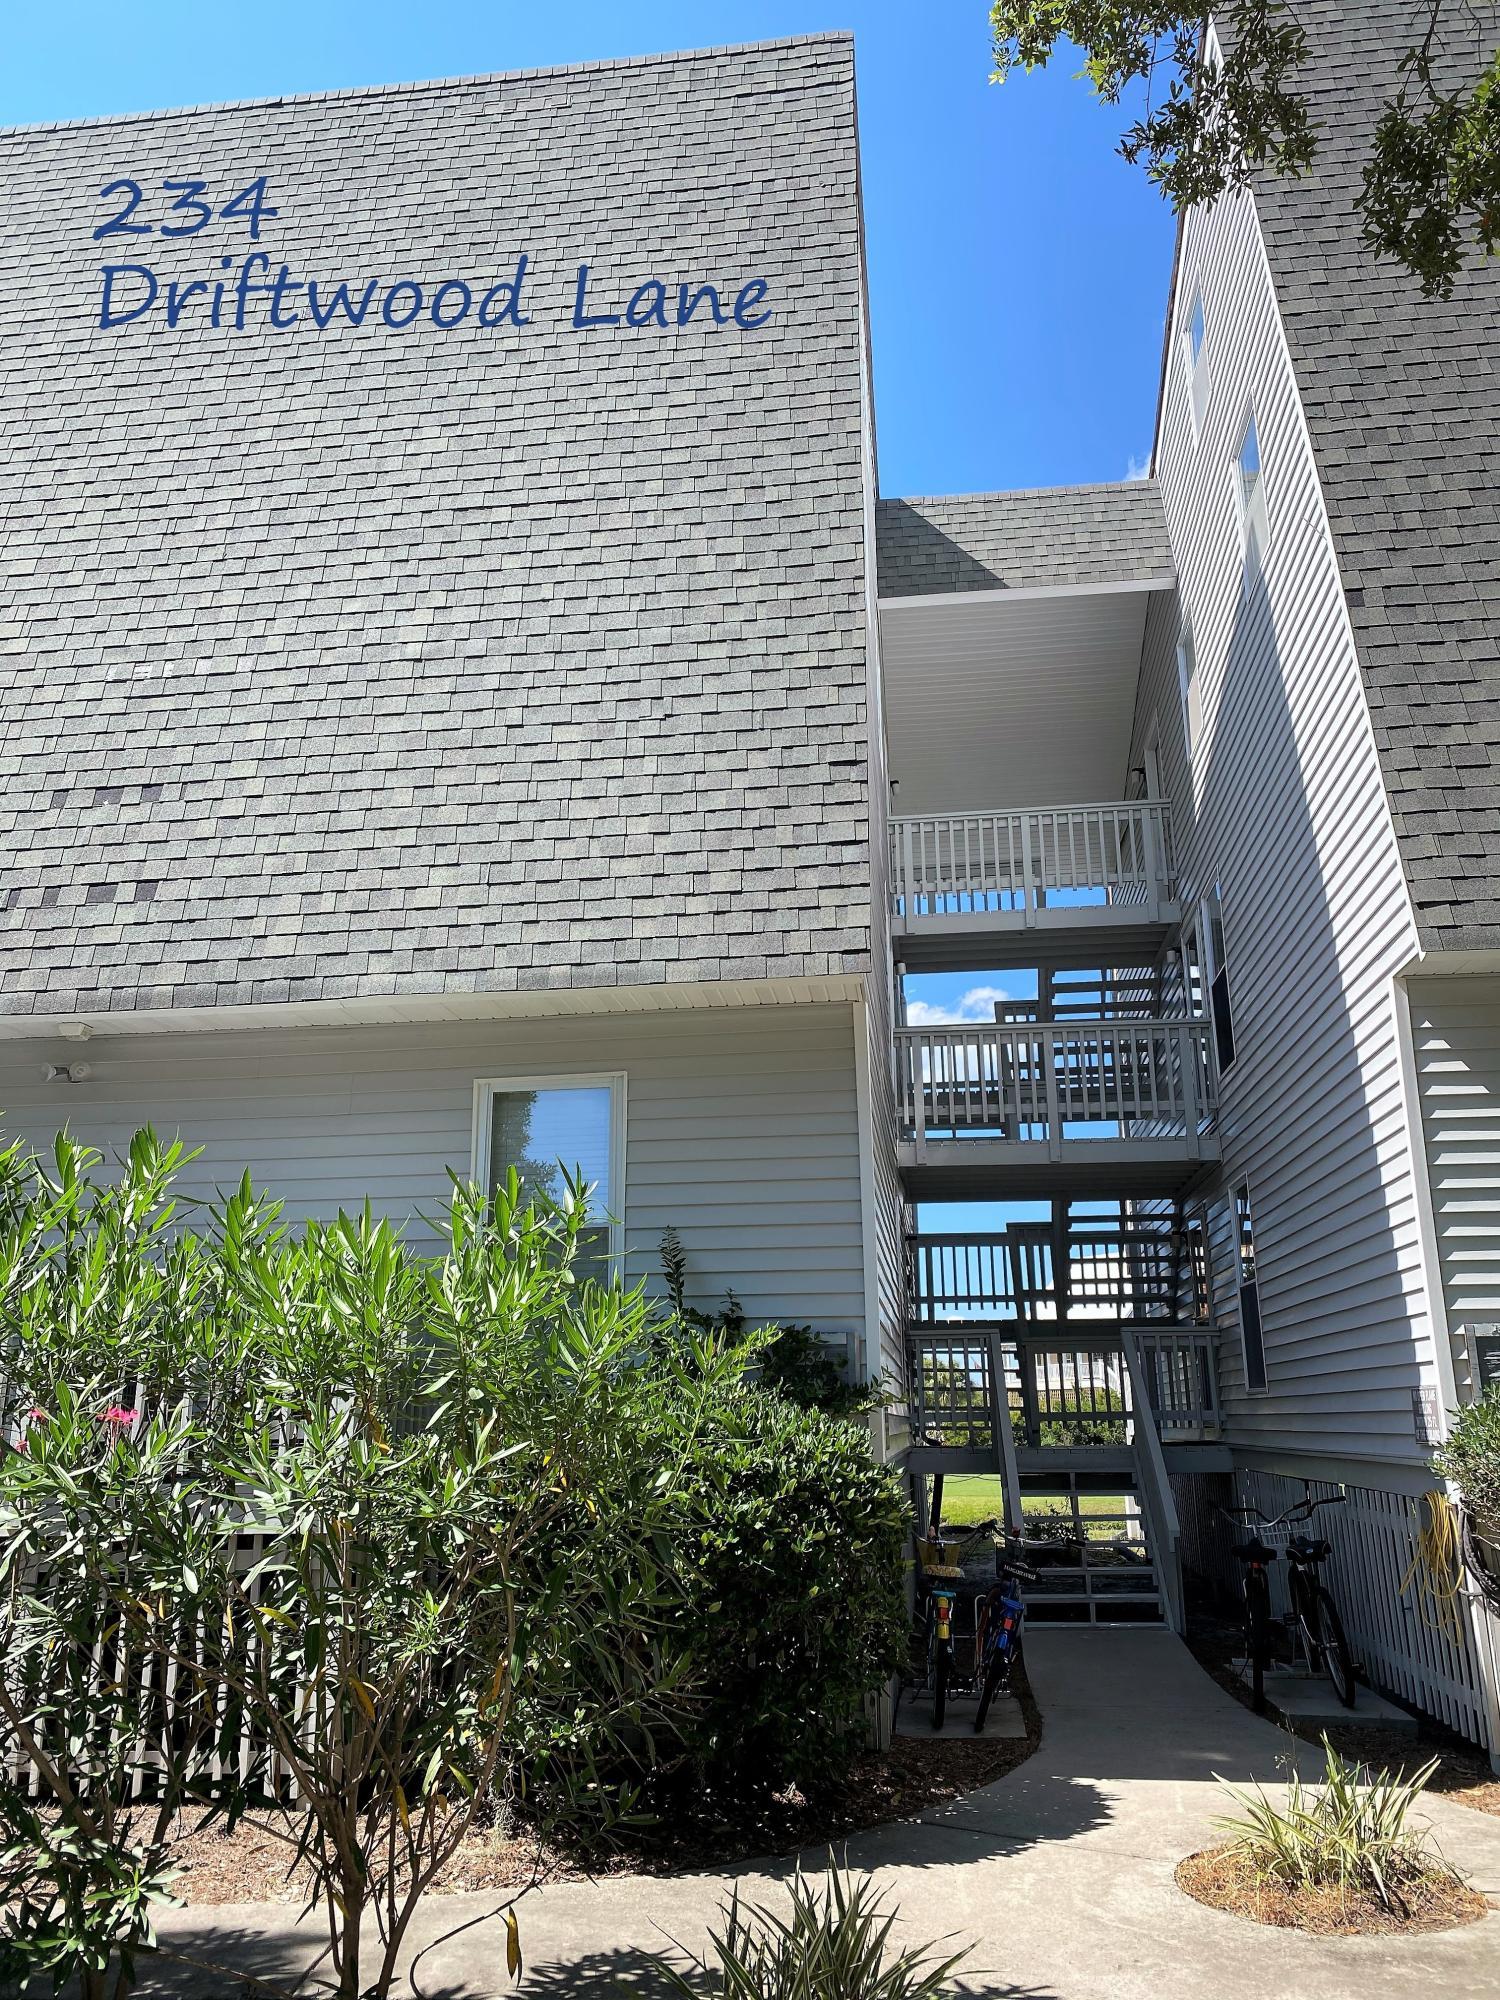 234 Driftwood Lane Edisto Island, SC 29438